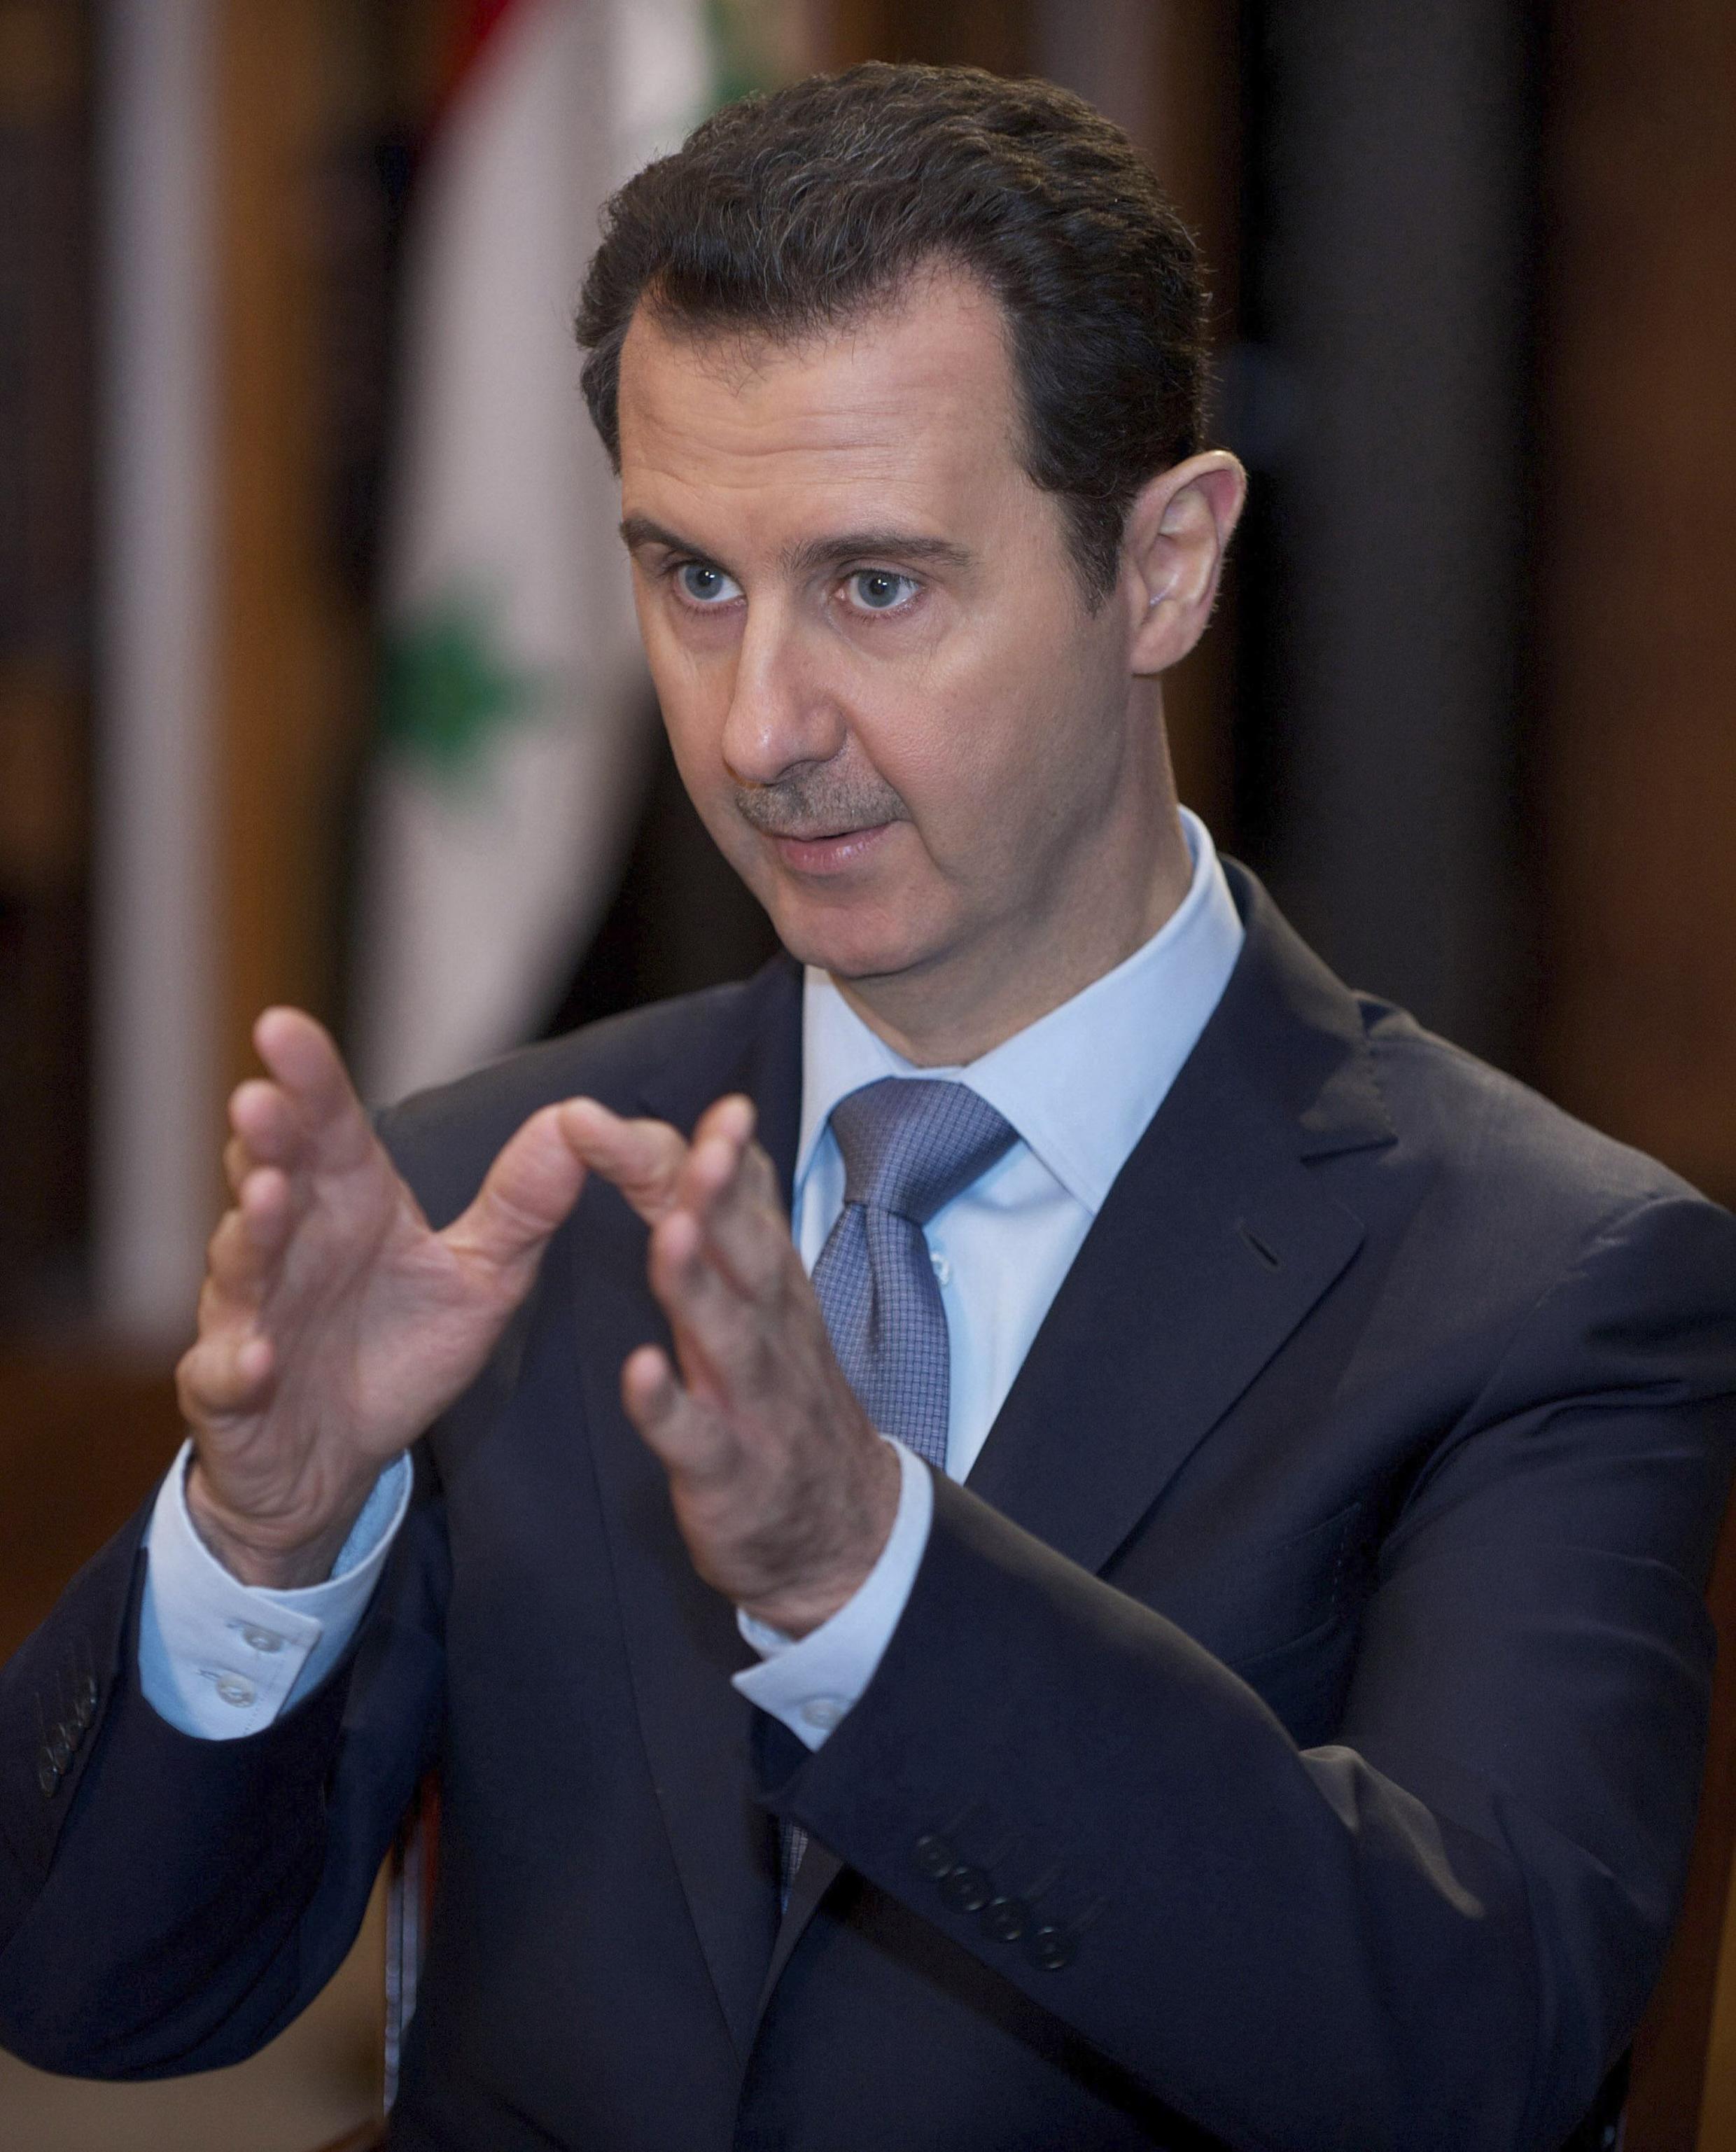 Интервью Башара Асада АФП в Дамаске 20/01/2014